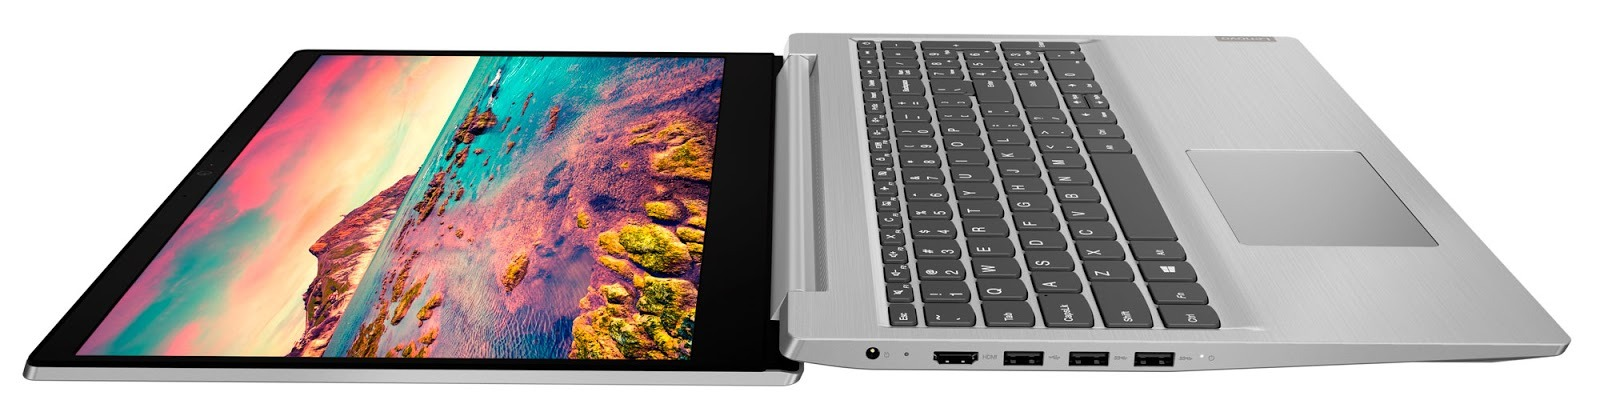 Фото 4. Ноутбук Lenovo ideapad S145-15IGM Platinum Grey (81MX001KRE)